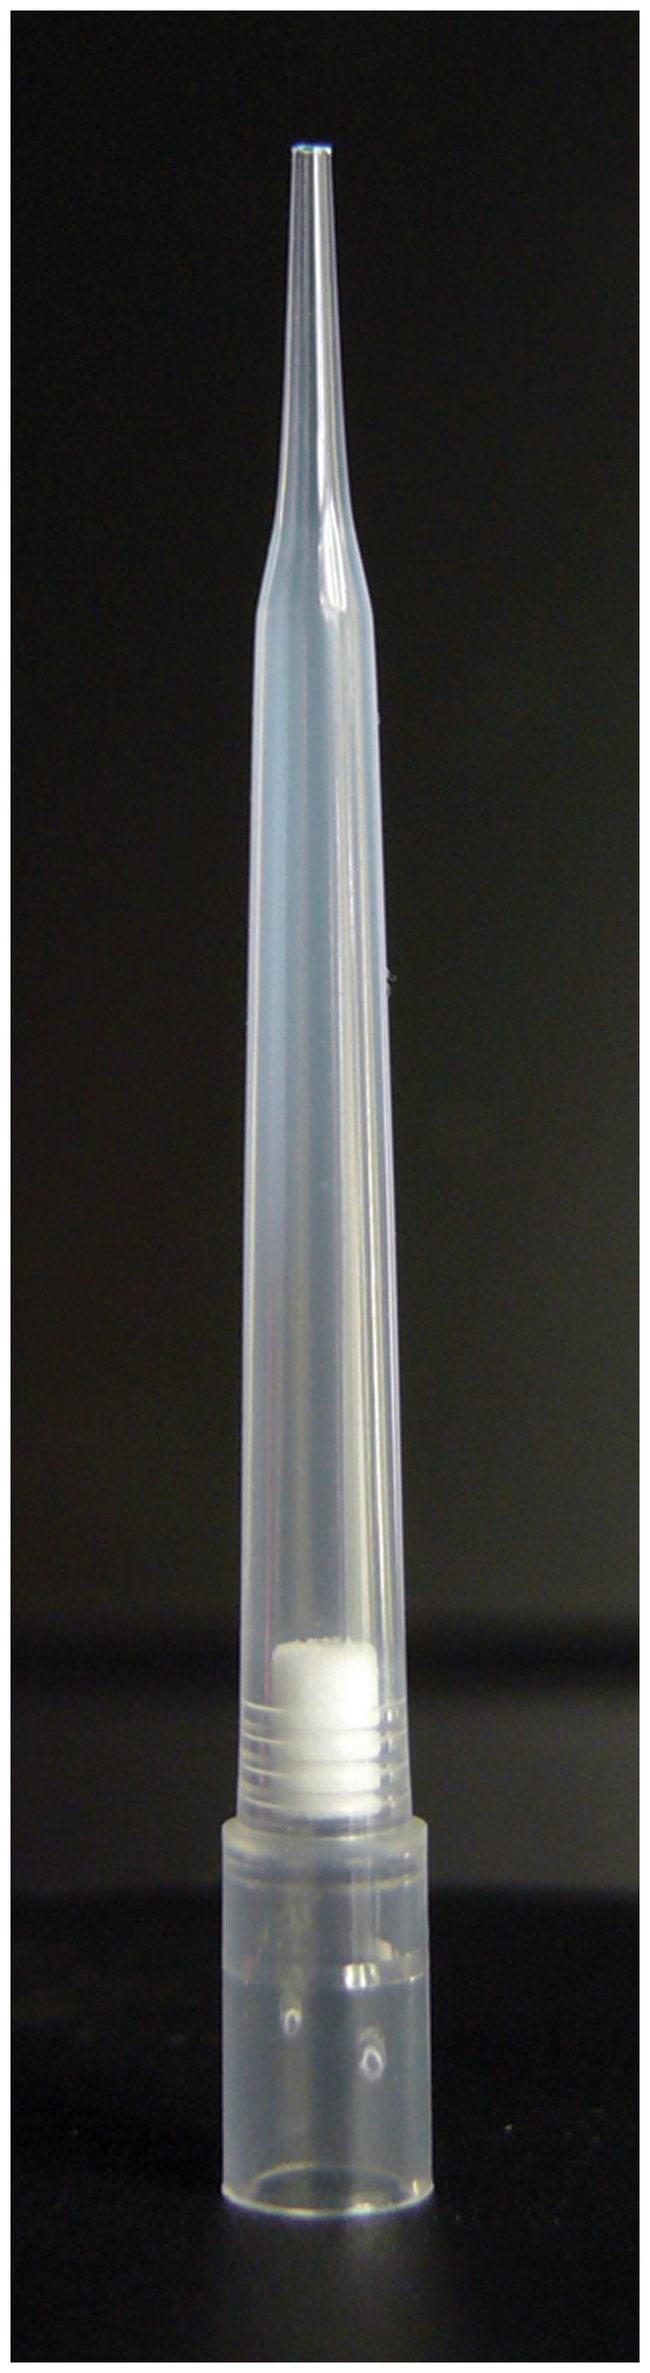 Axygen™ Biomek™ FX/NX Aerosol Barrier Filtered Robotic Tips